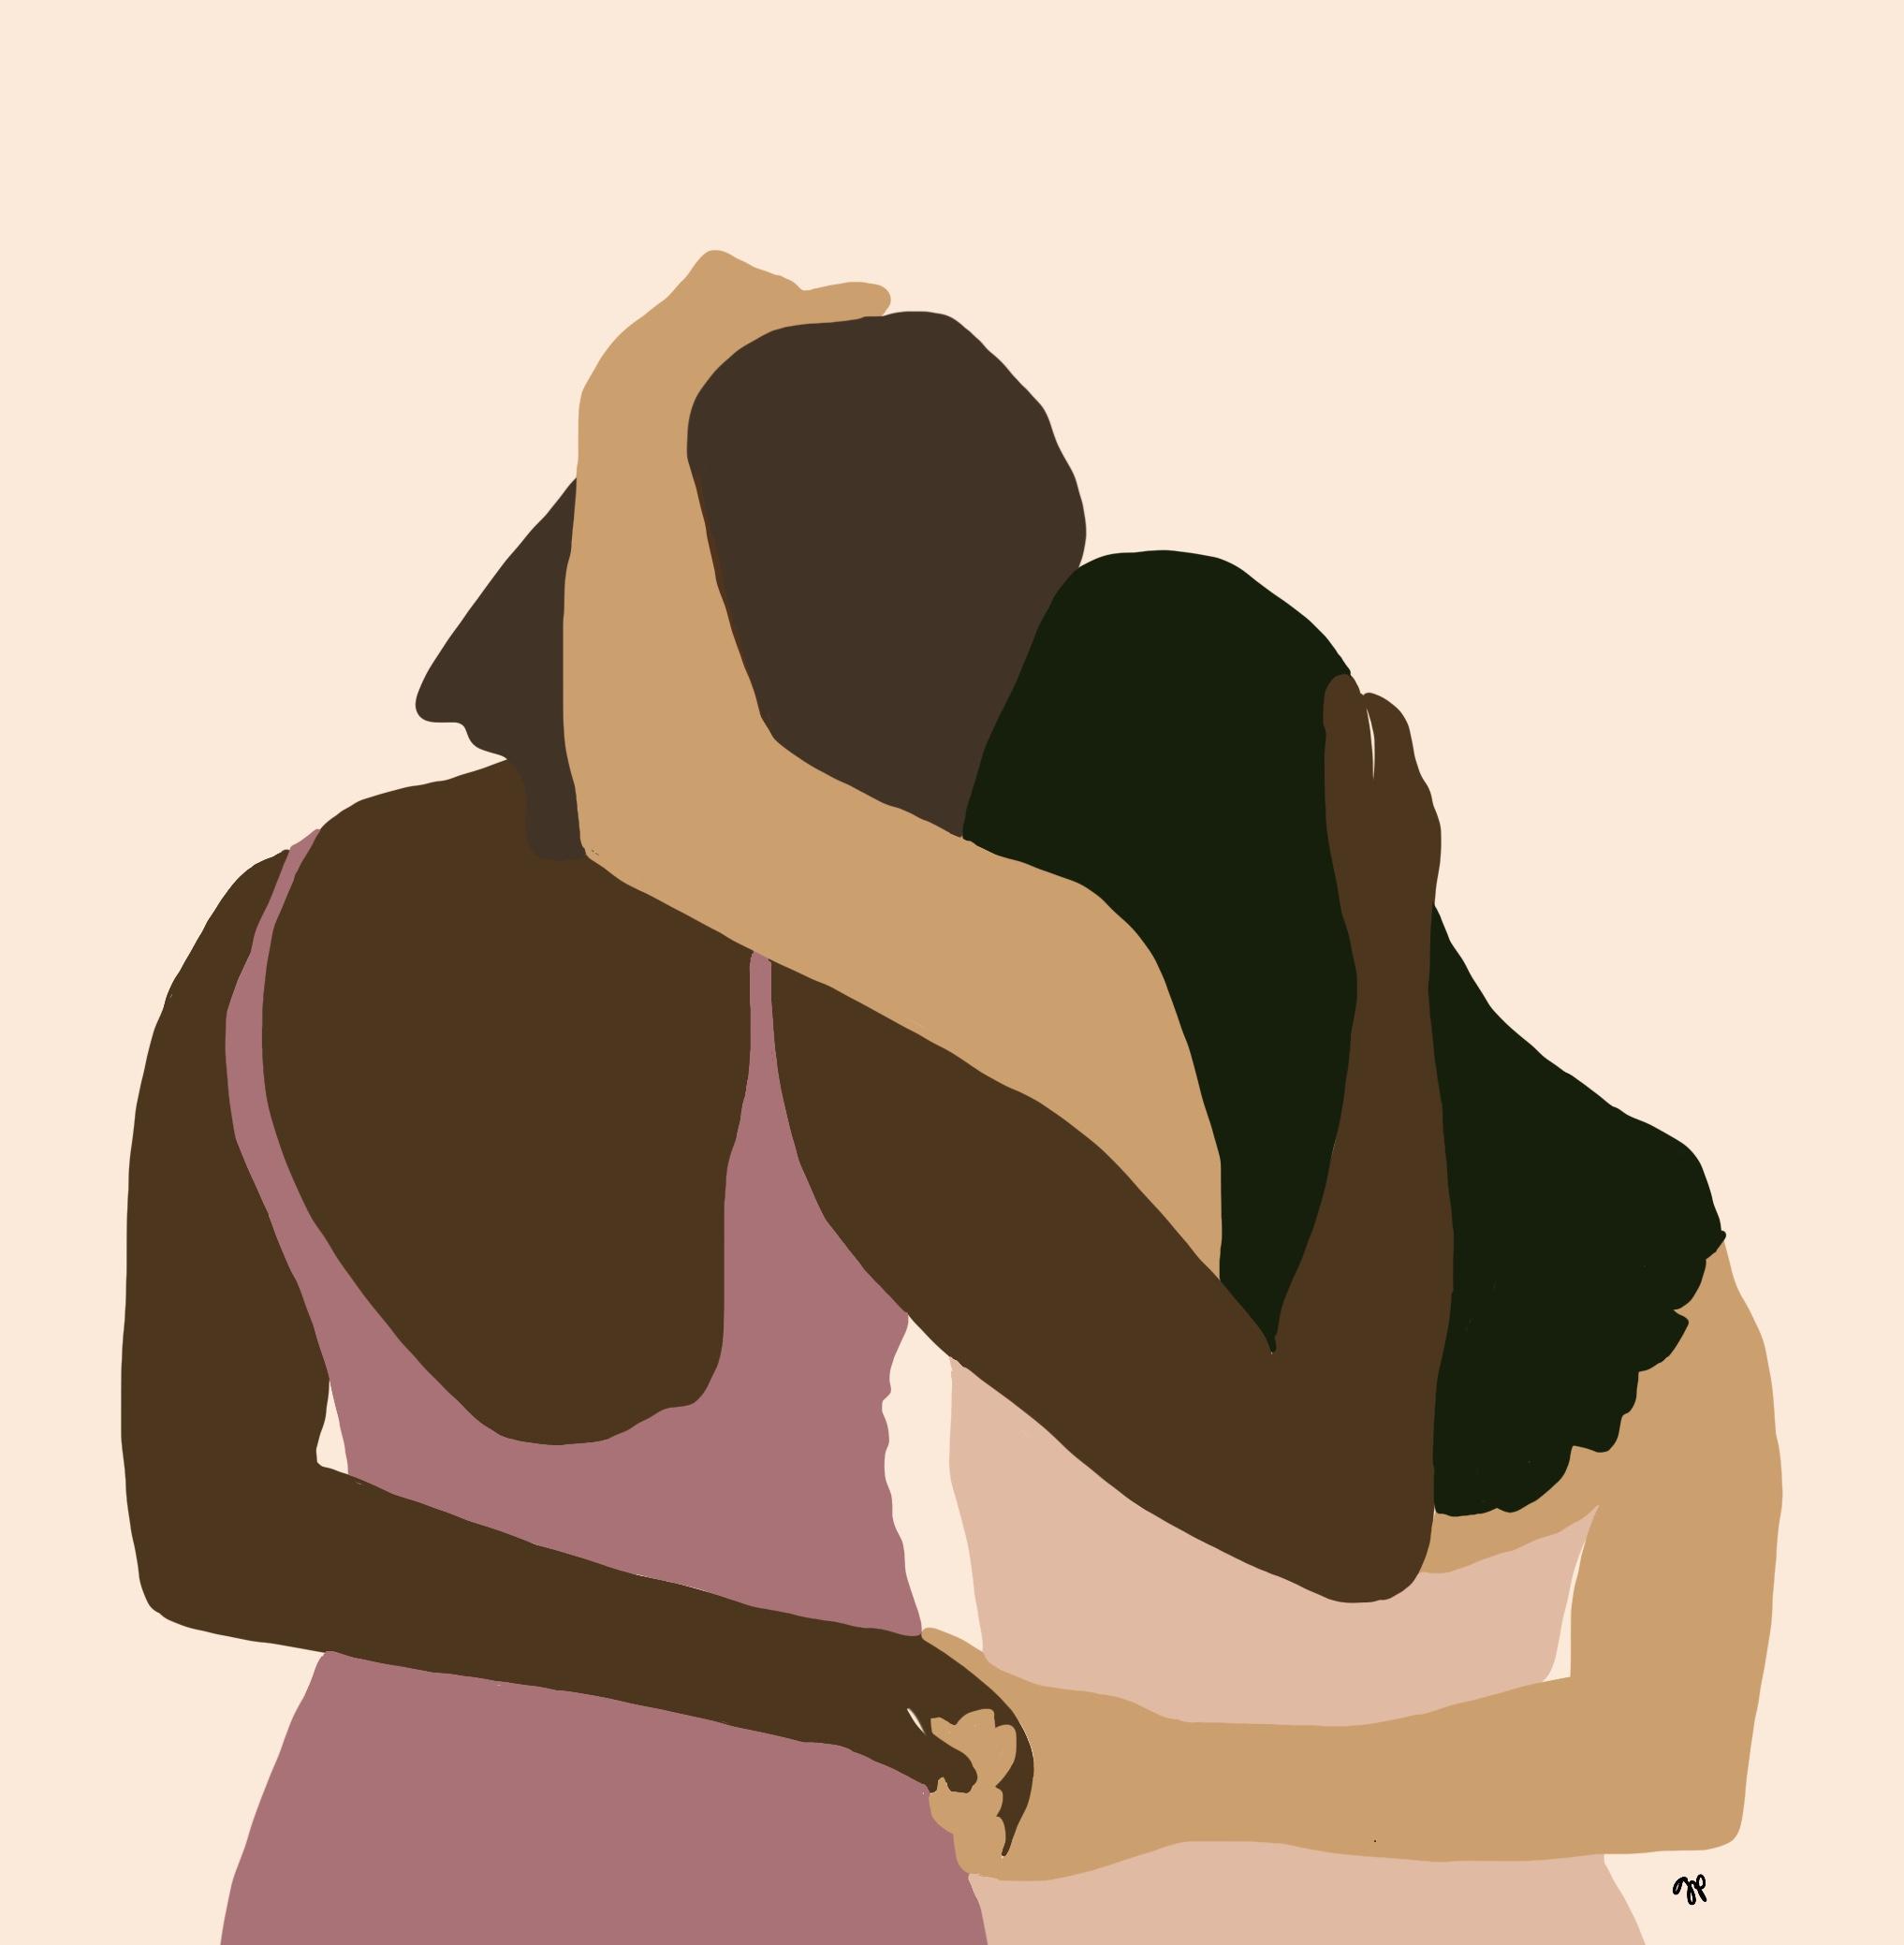 women's embrace by guady pleskacz